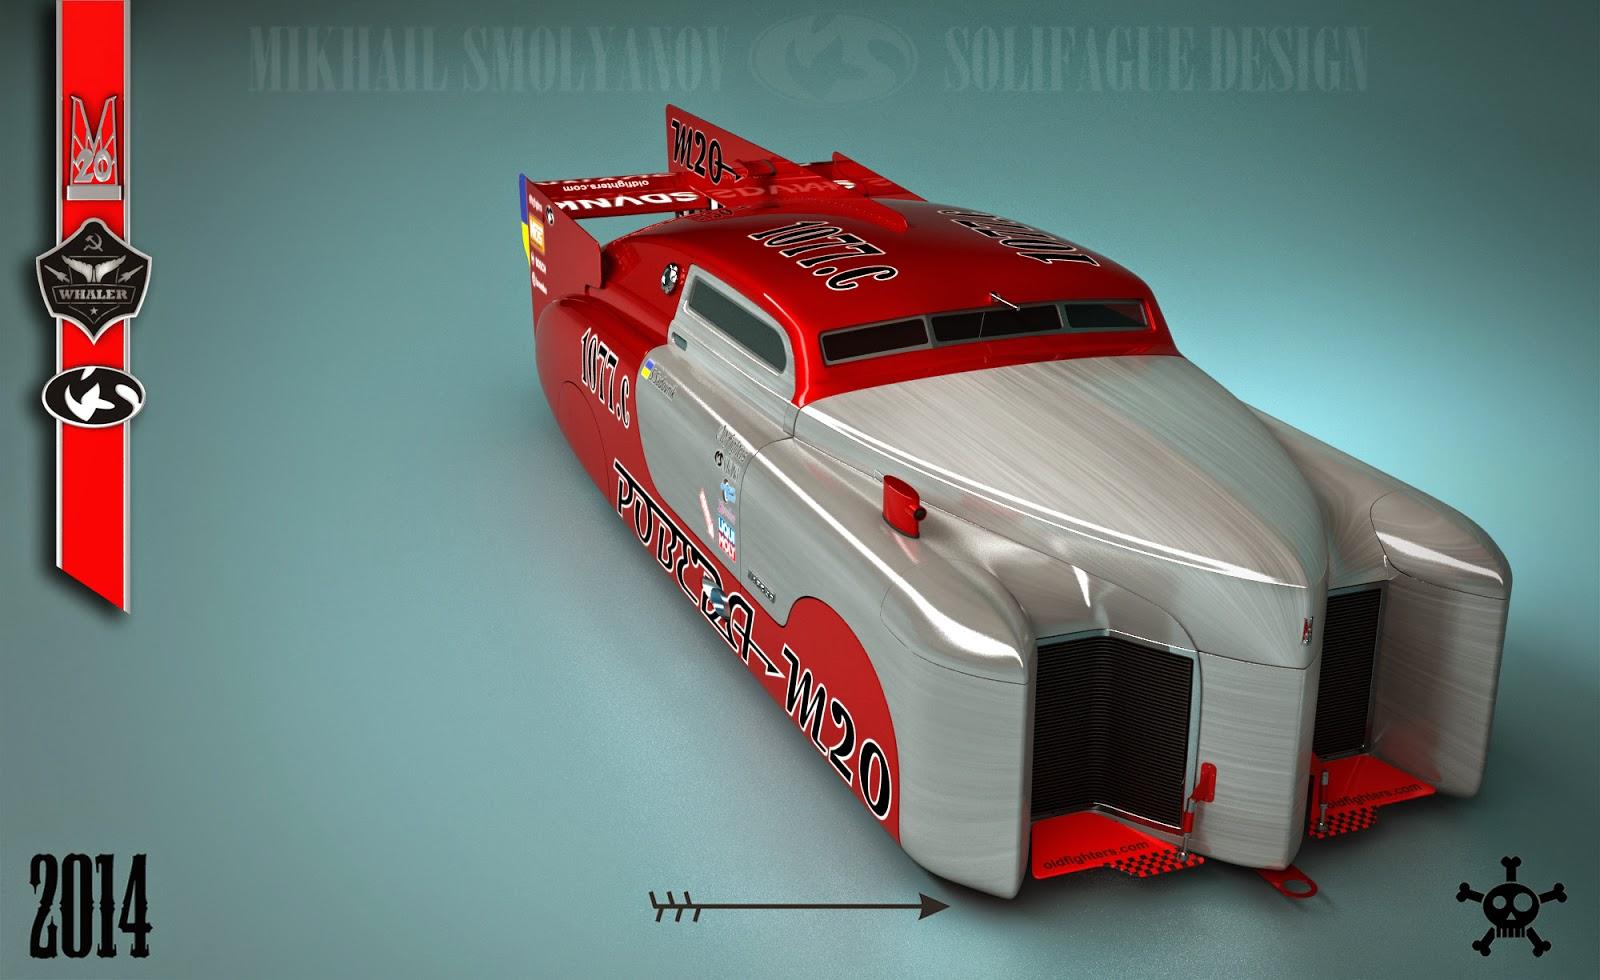 Soviet M20 Pobeda Redesigned To Race At Bonneville Salt